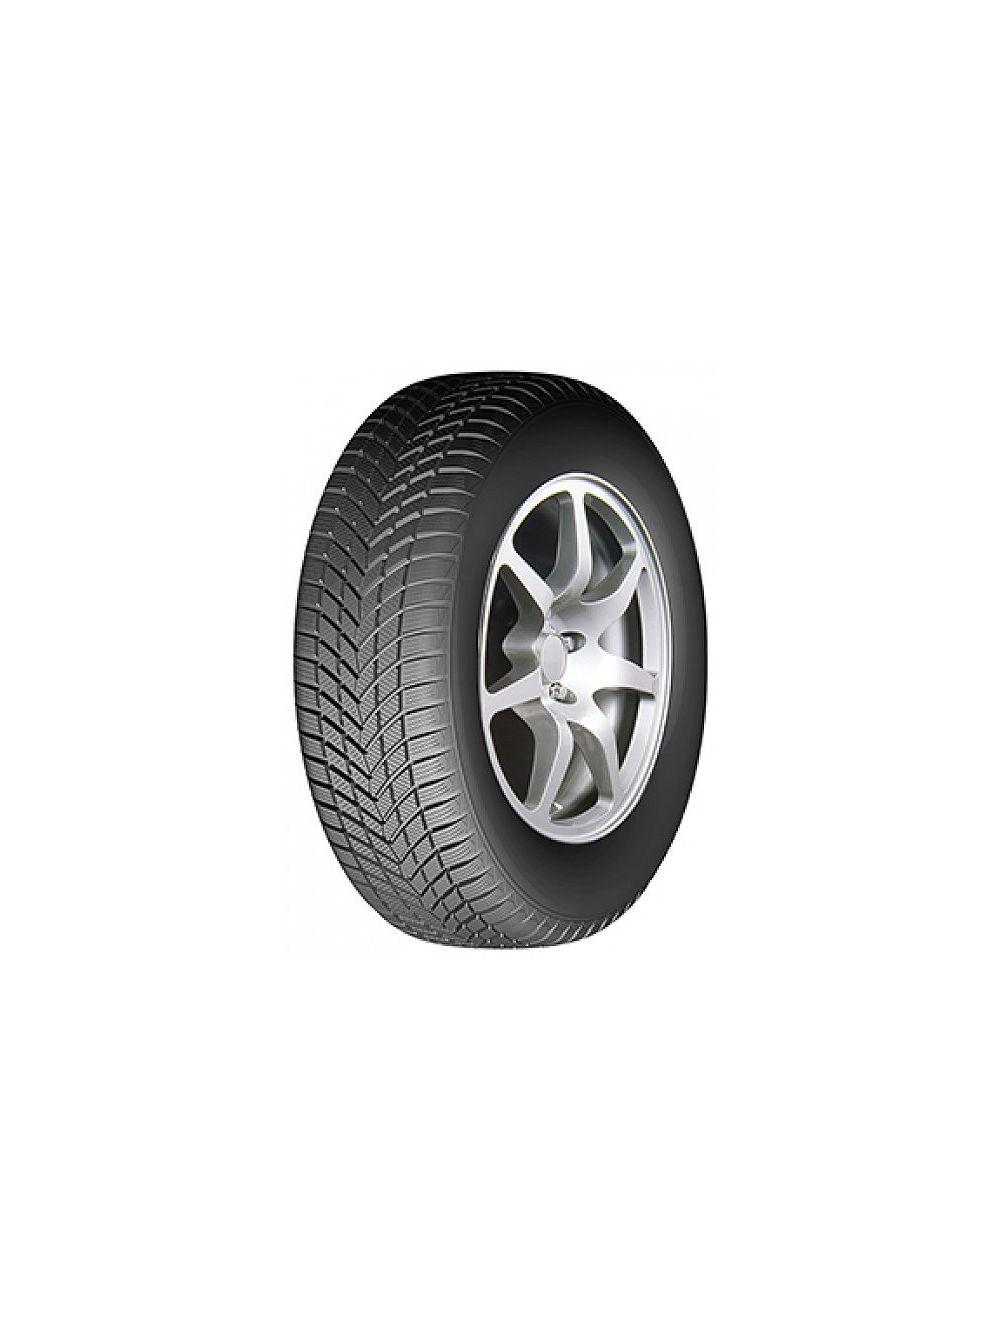 Infinity 195/55R16 H EcoZen XL Téli gumi